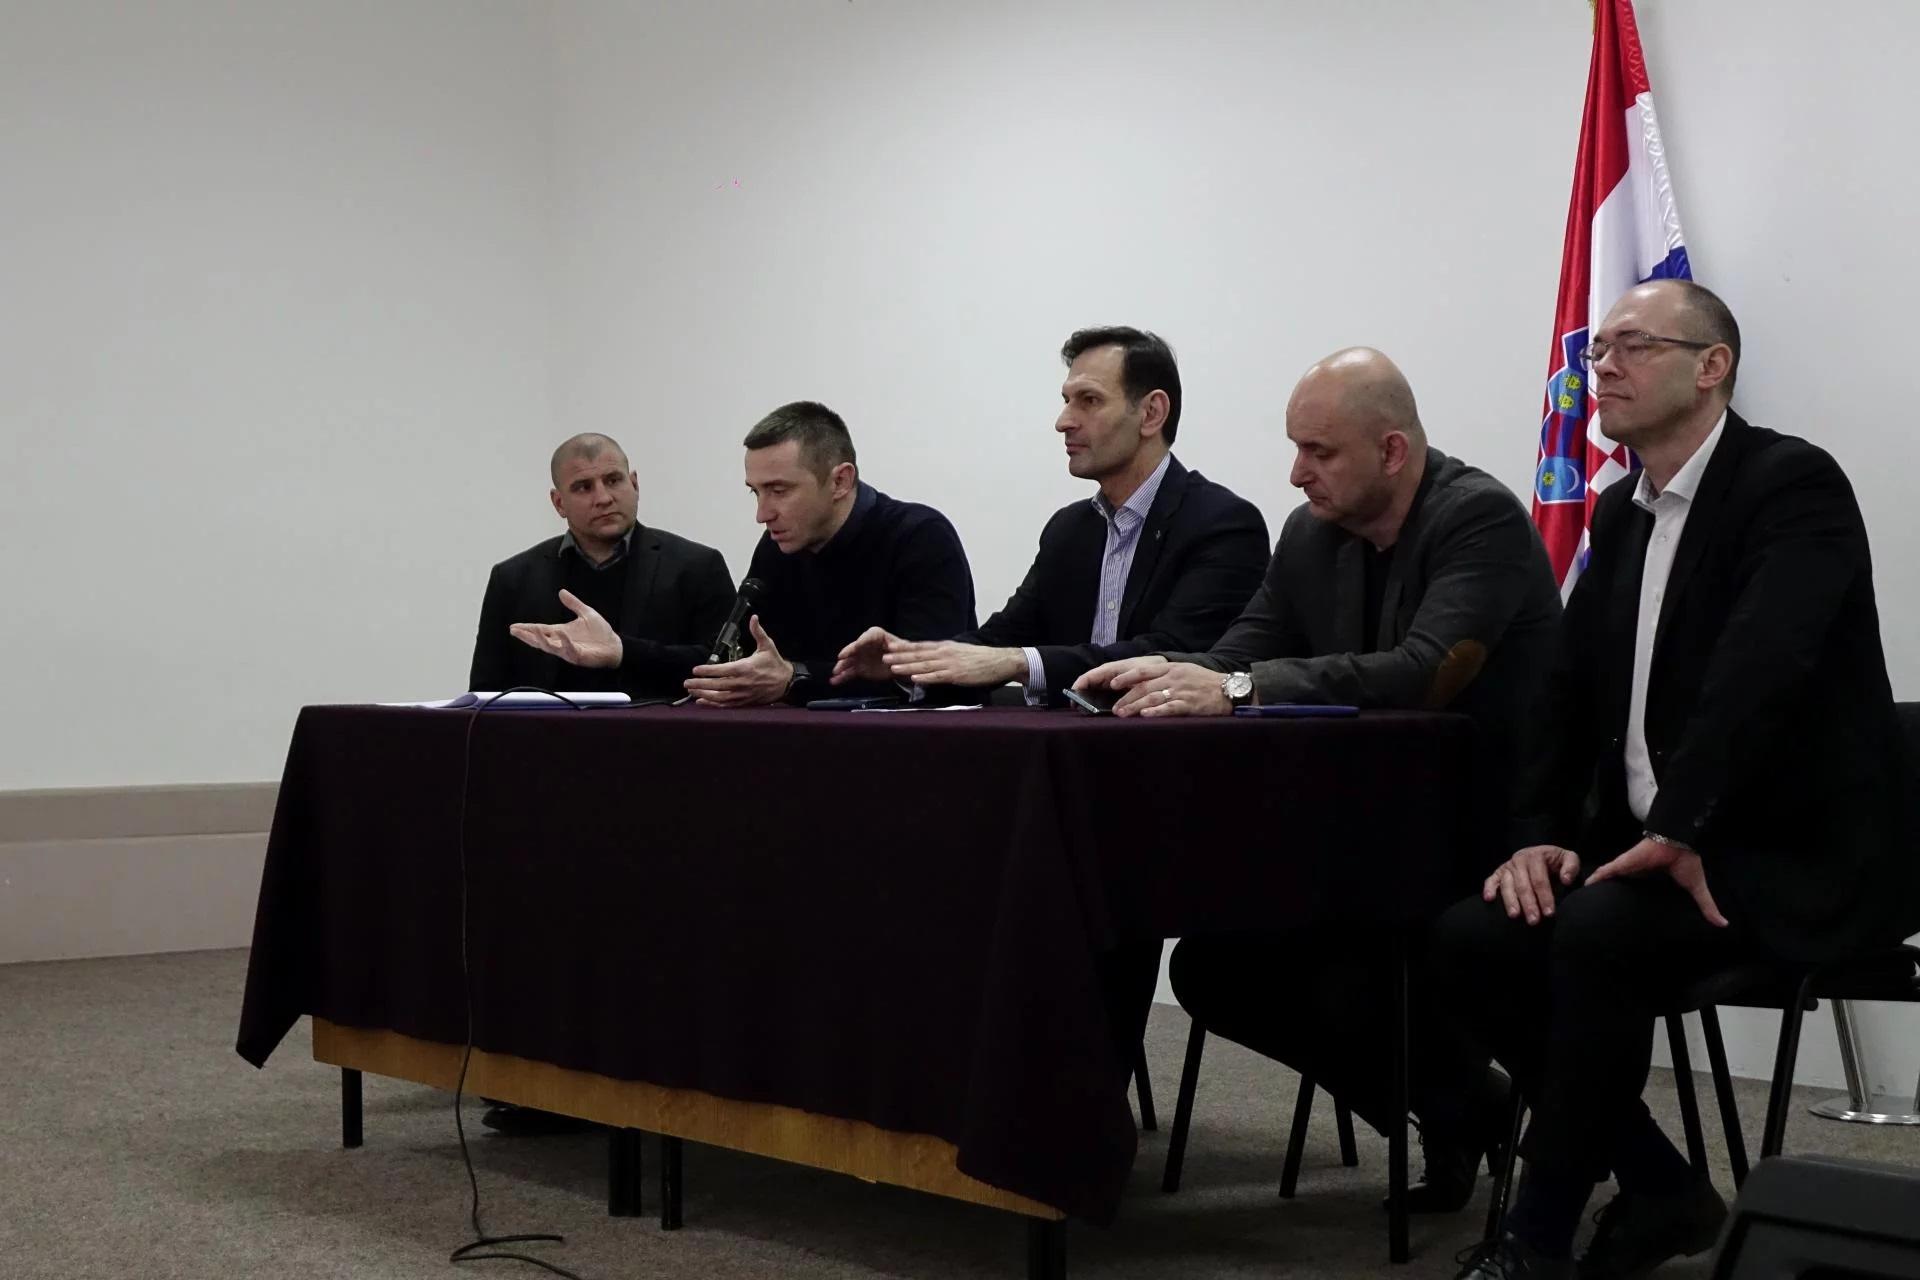 Ivan Penava, Miro Kovač, Tomislav Tolušić i Davor Ivo Stier